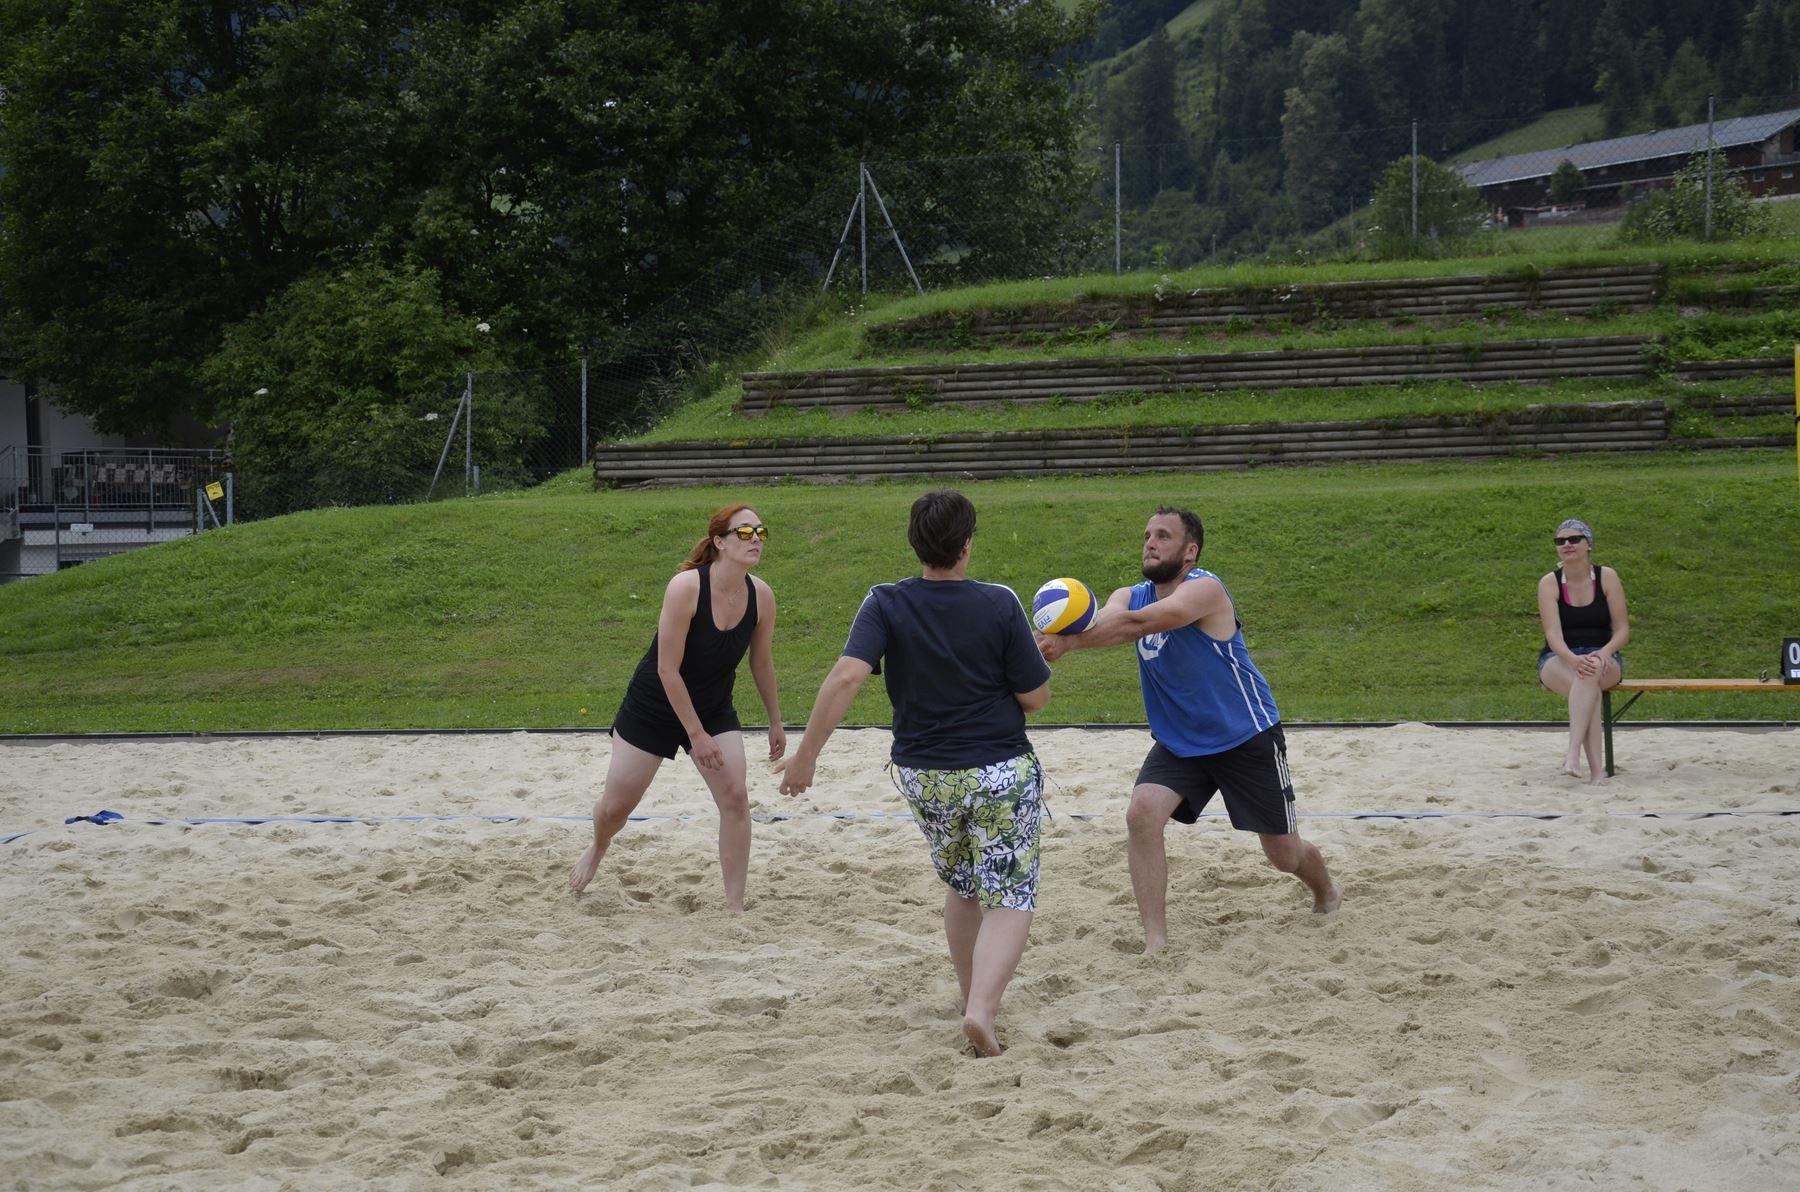 2016-07-02 Beachvolleyball 108